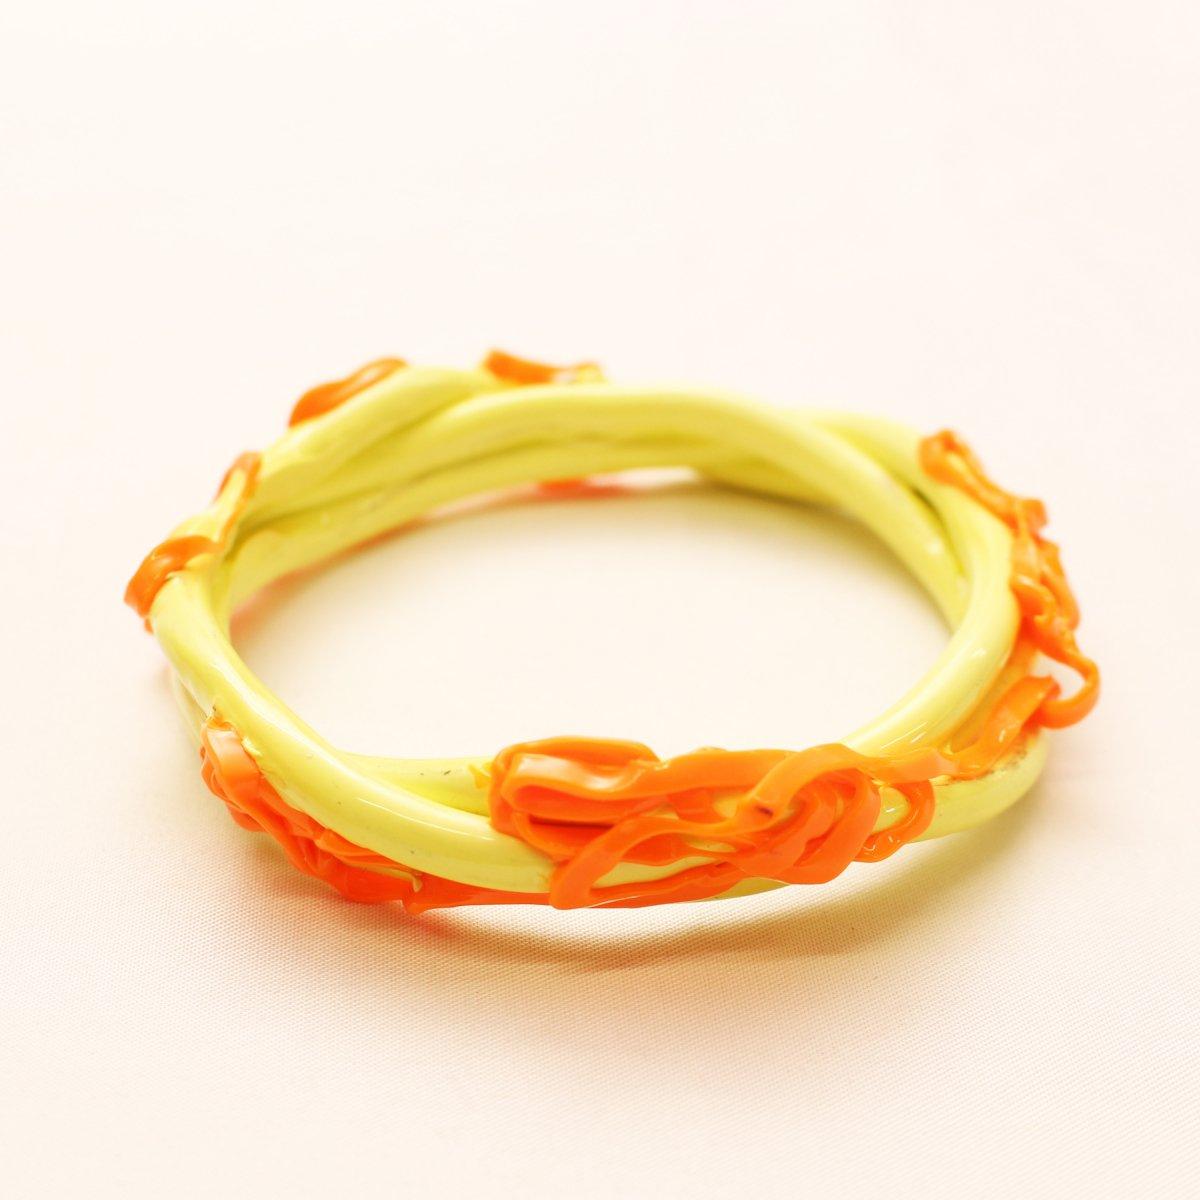 wrist bands【YELLOW×ORANGE】